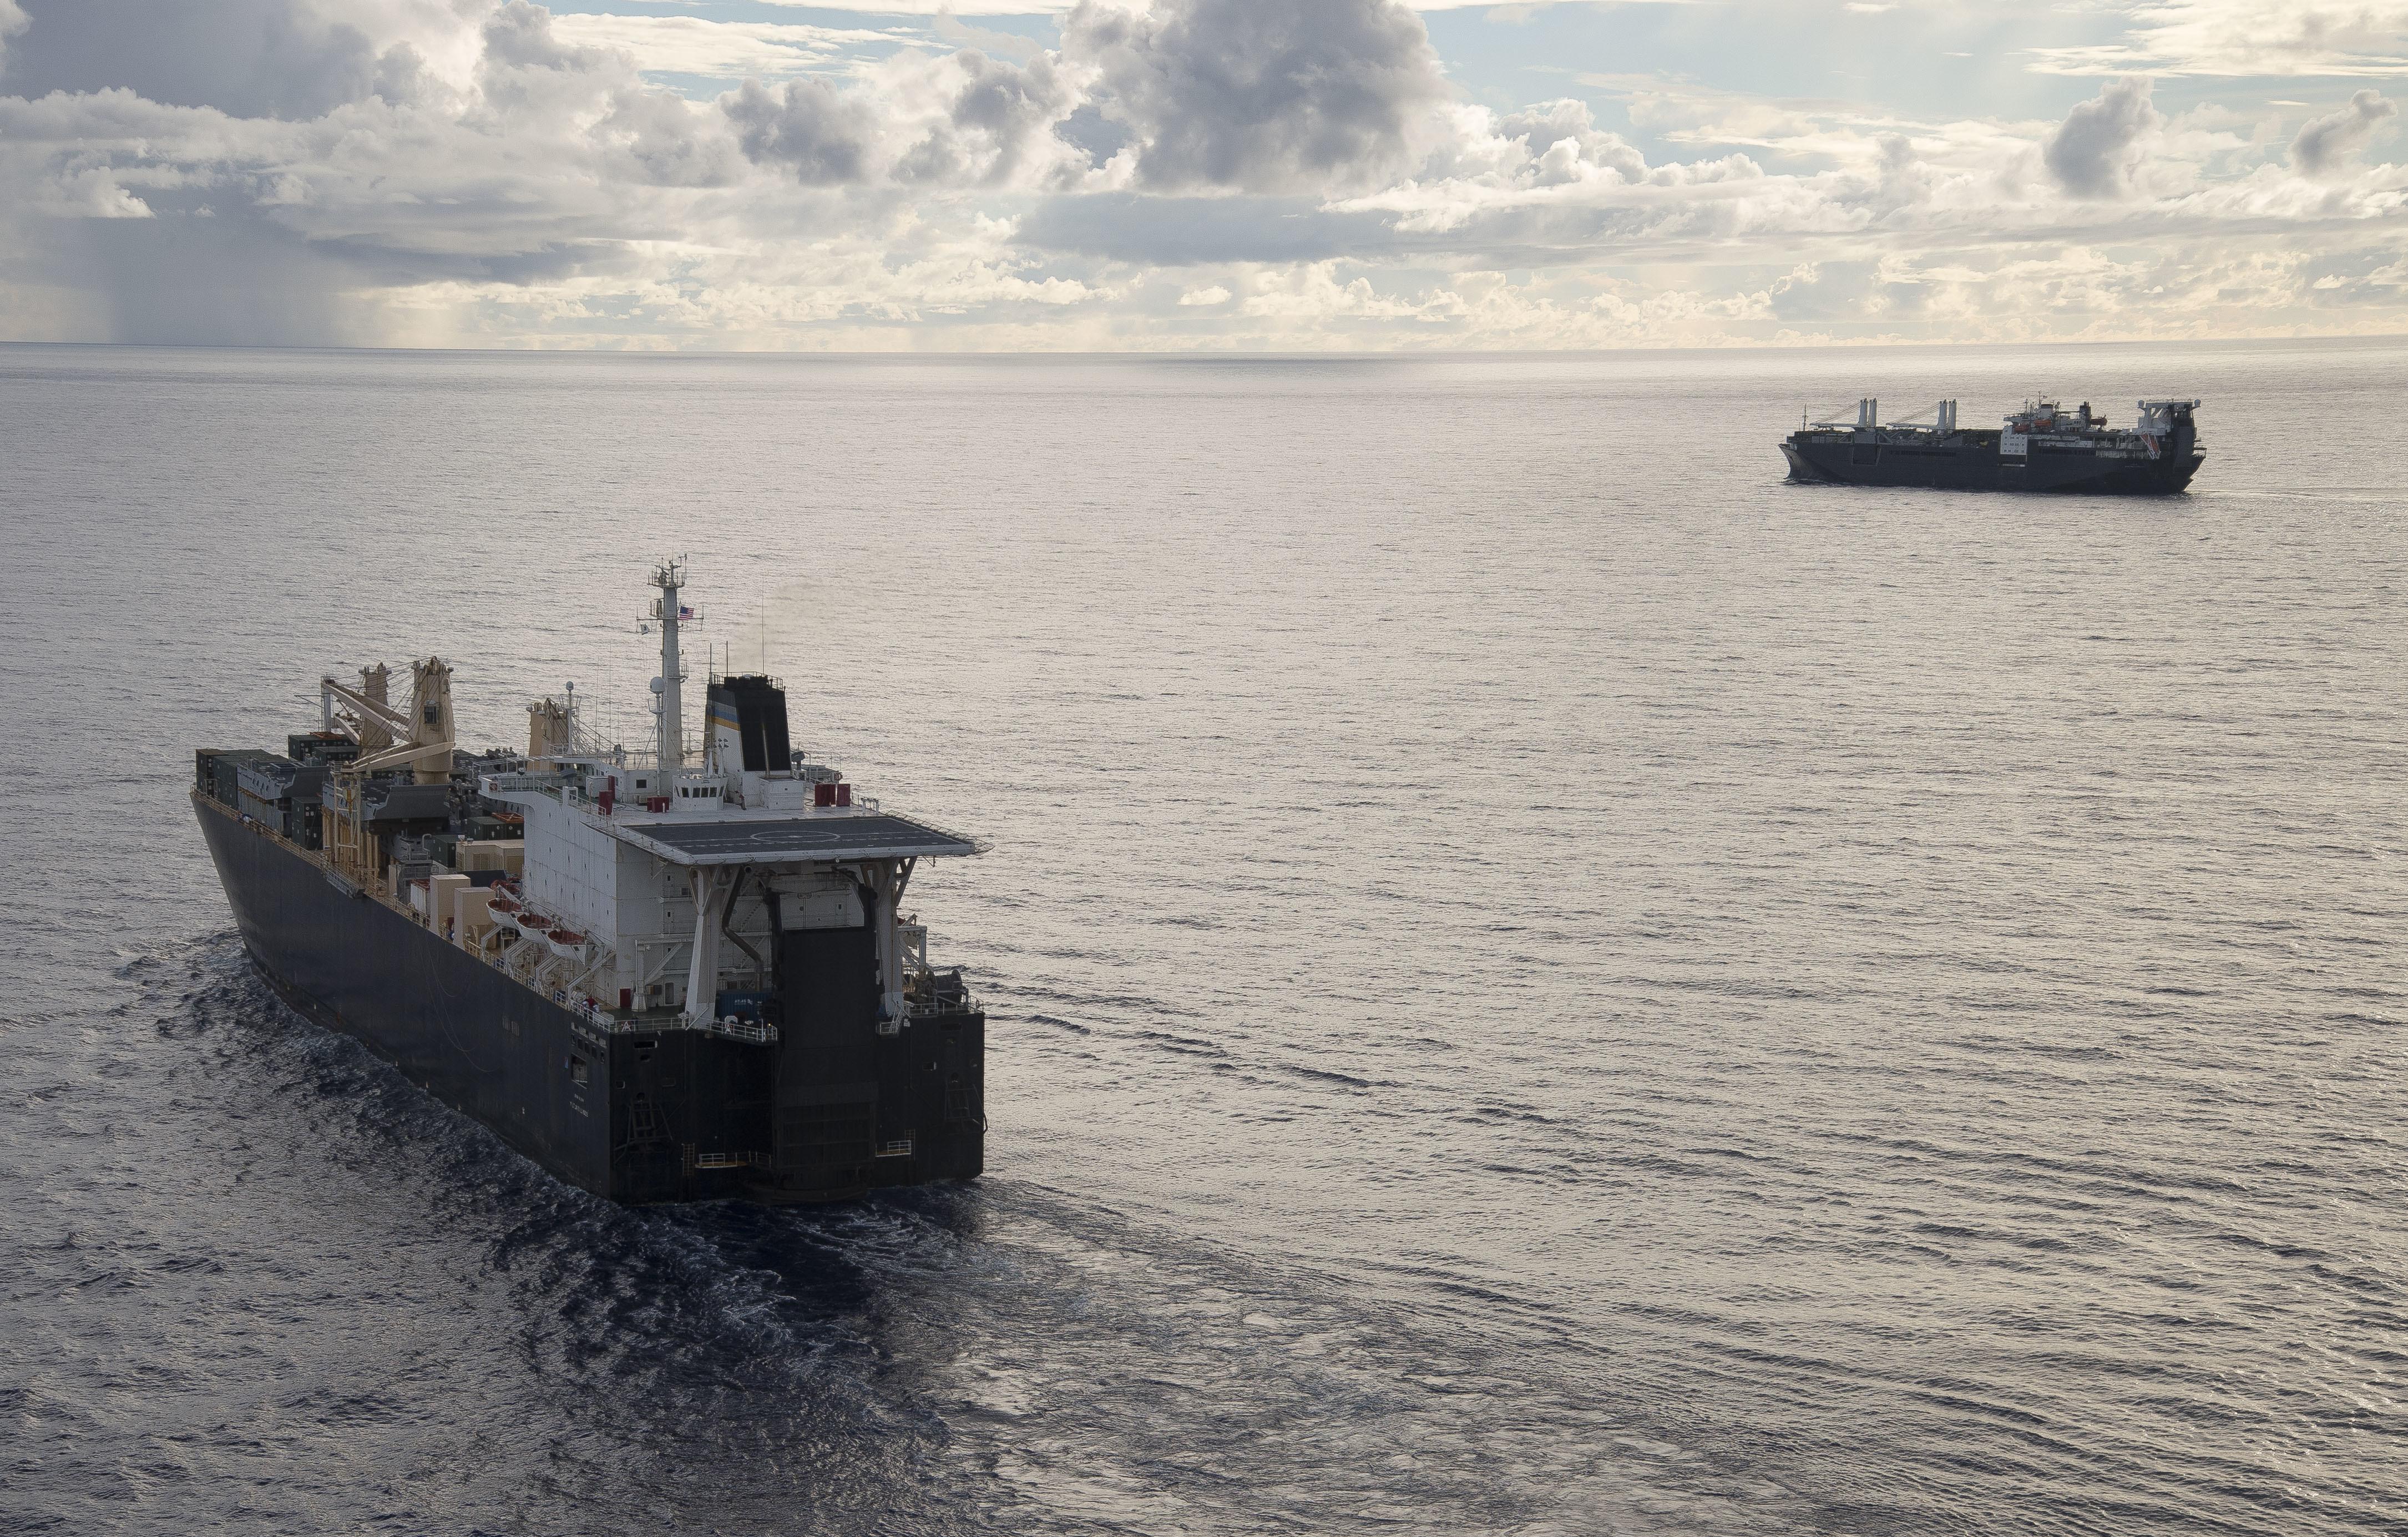 USNS 1st LT Jack Lummus (T-AK 3011) executes a Group Sail with Maritime Prepositioning Ships Squadron (MPSRON 3) off the coast of Guam, Oct. 4, 2017.